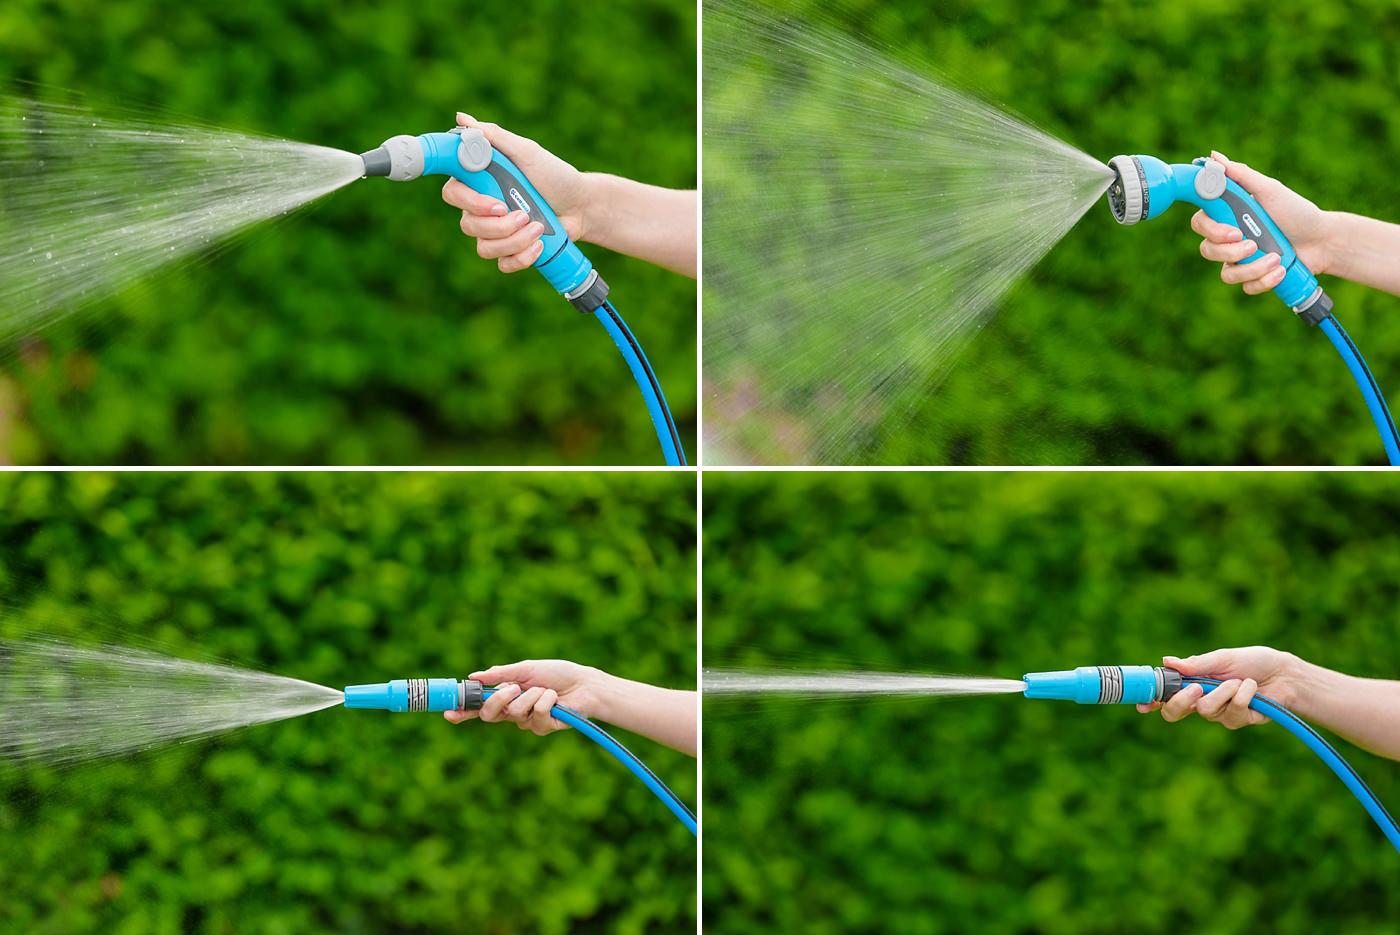 Spray_006small.jpg